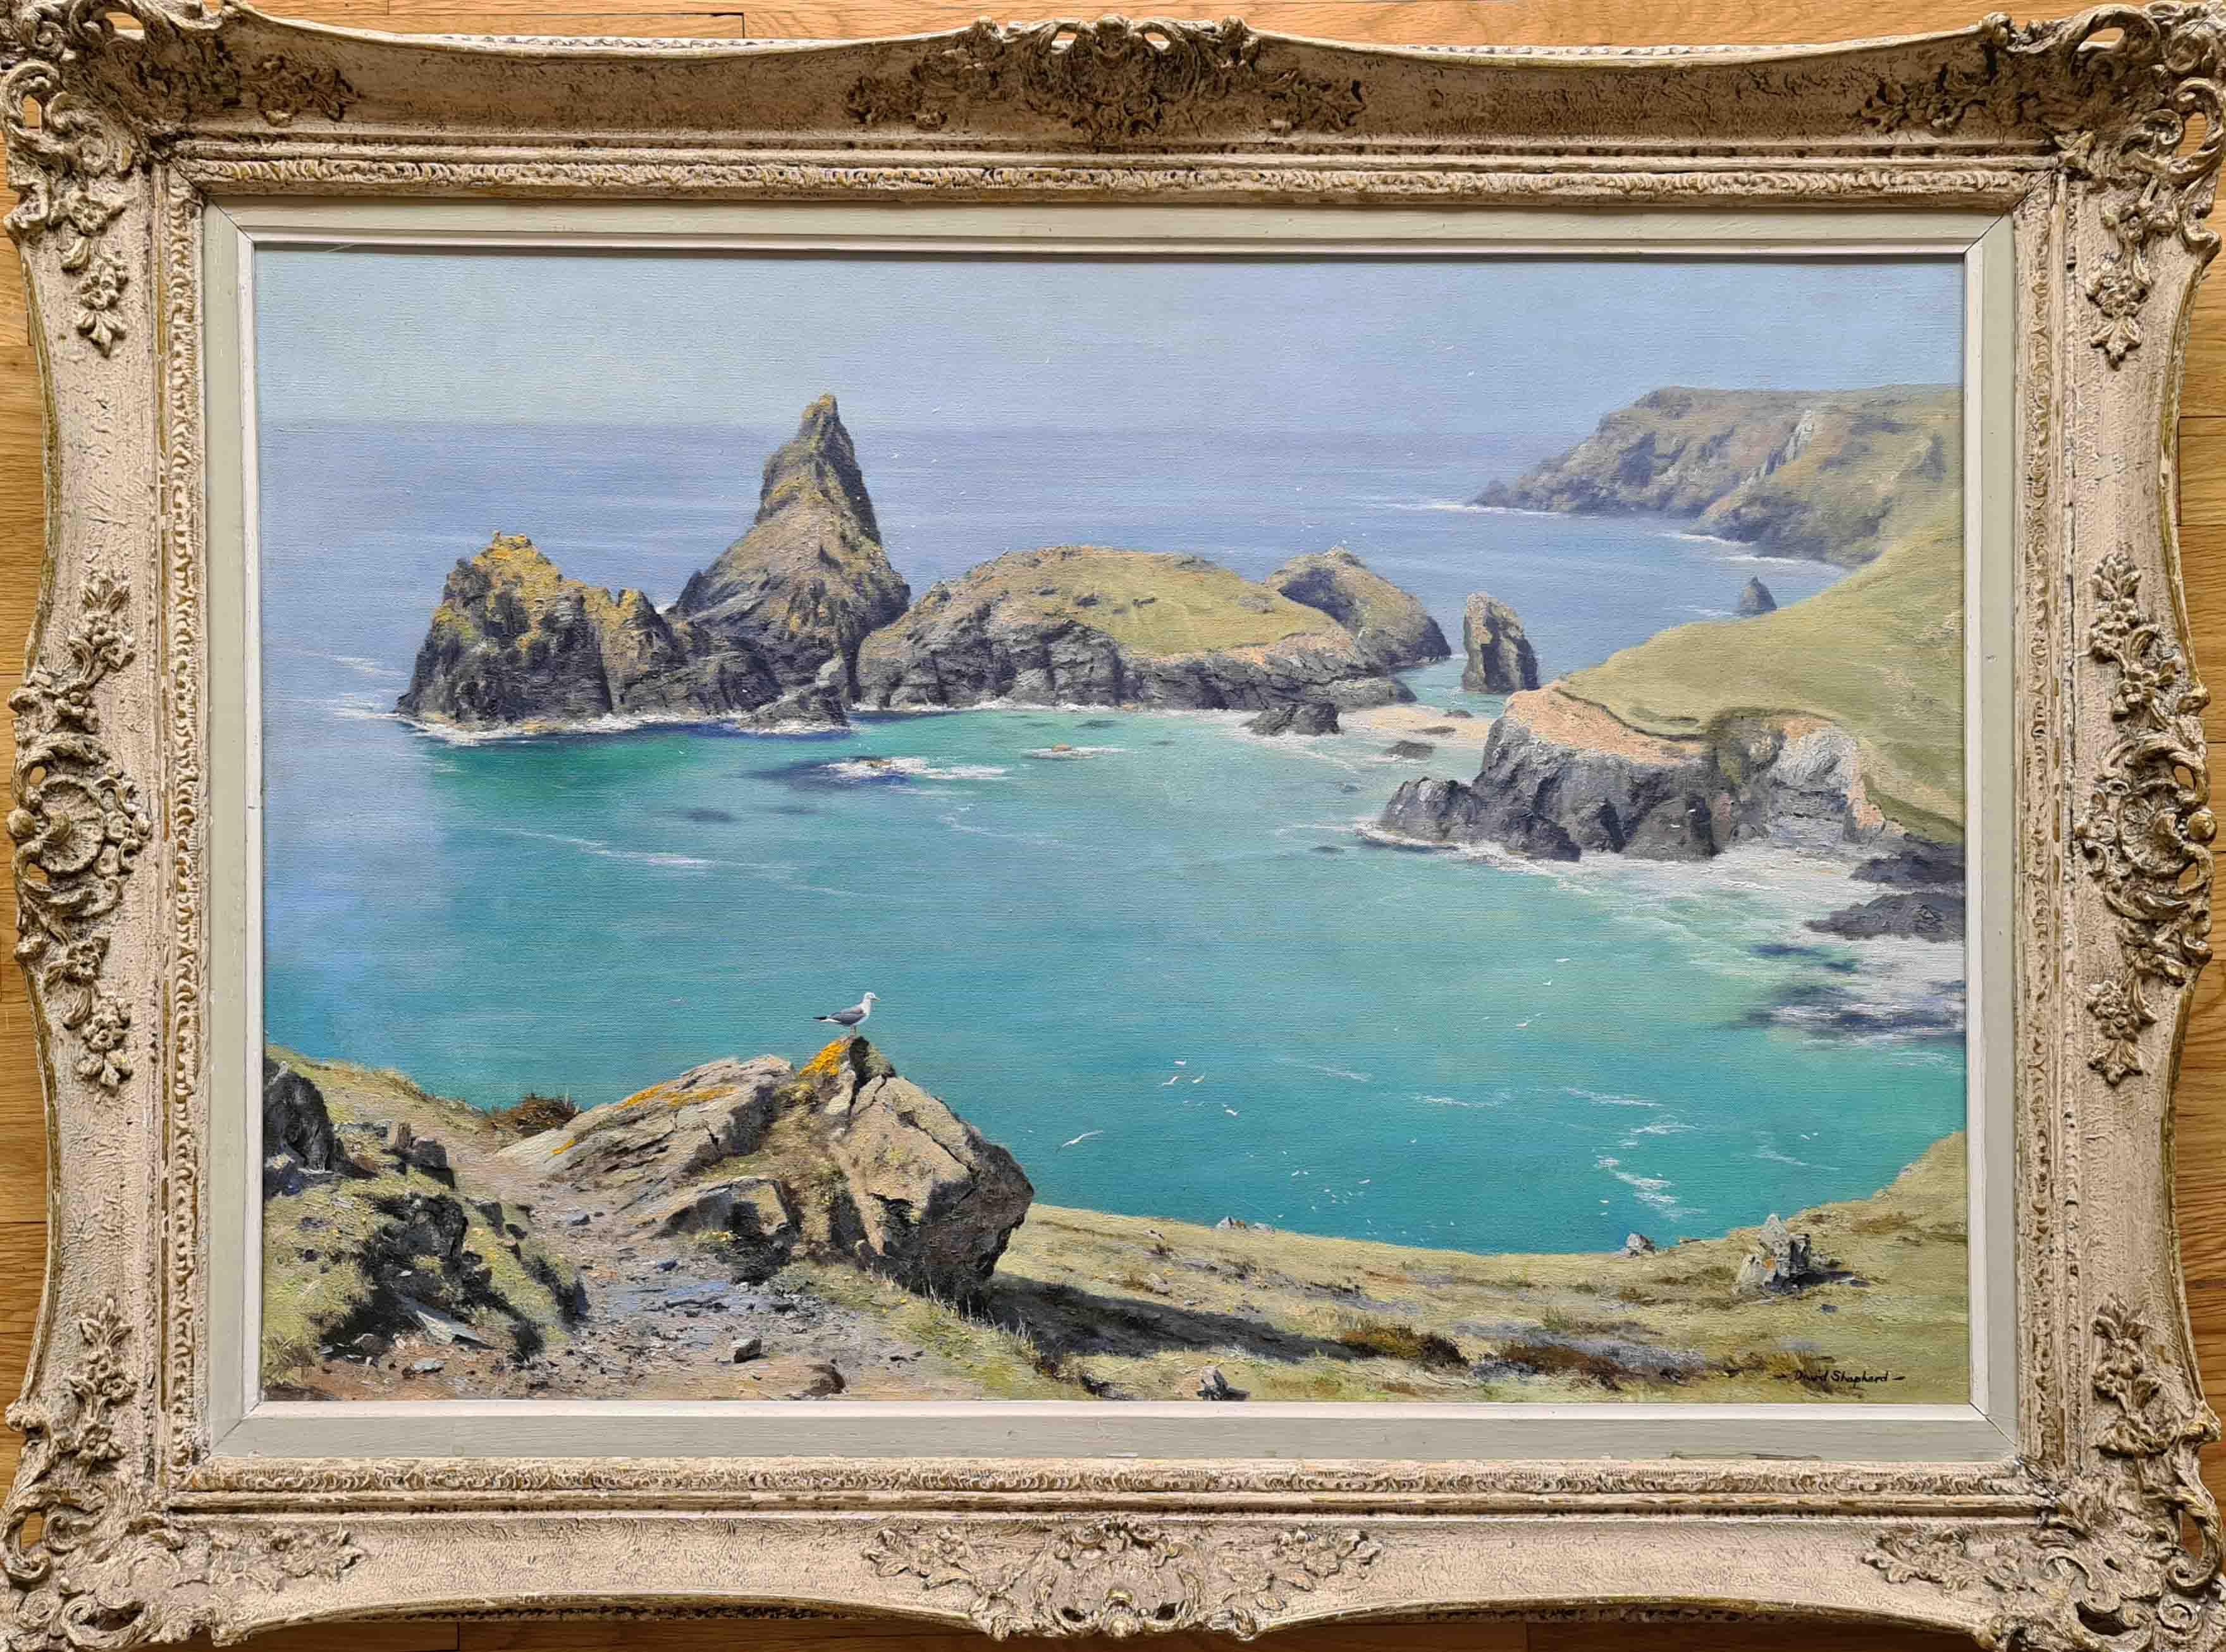 david shepherd original, Kynance Cove, Cornwall, England, painting